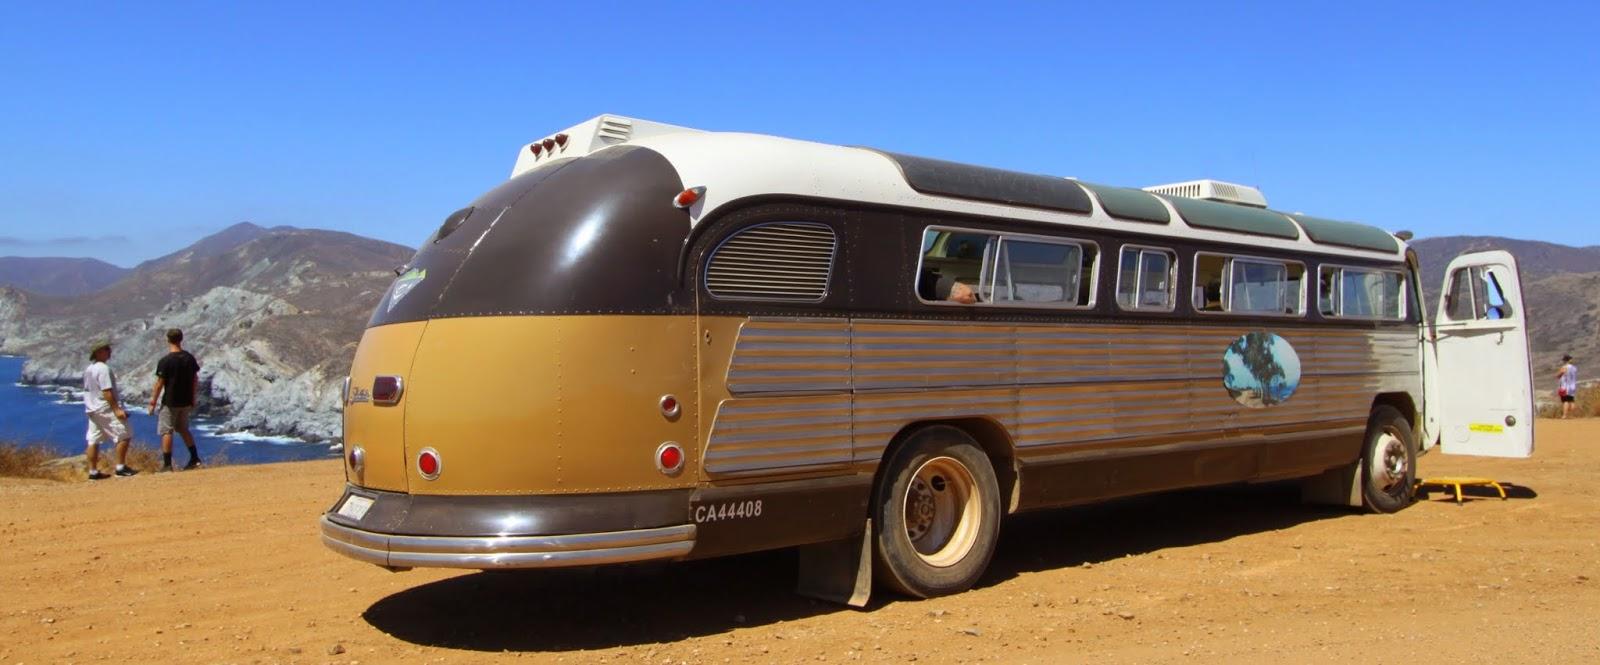 Santa Catalina Island, California, Bus Tour